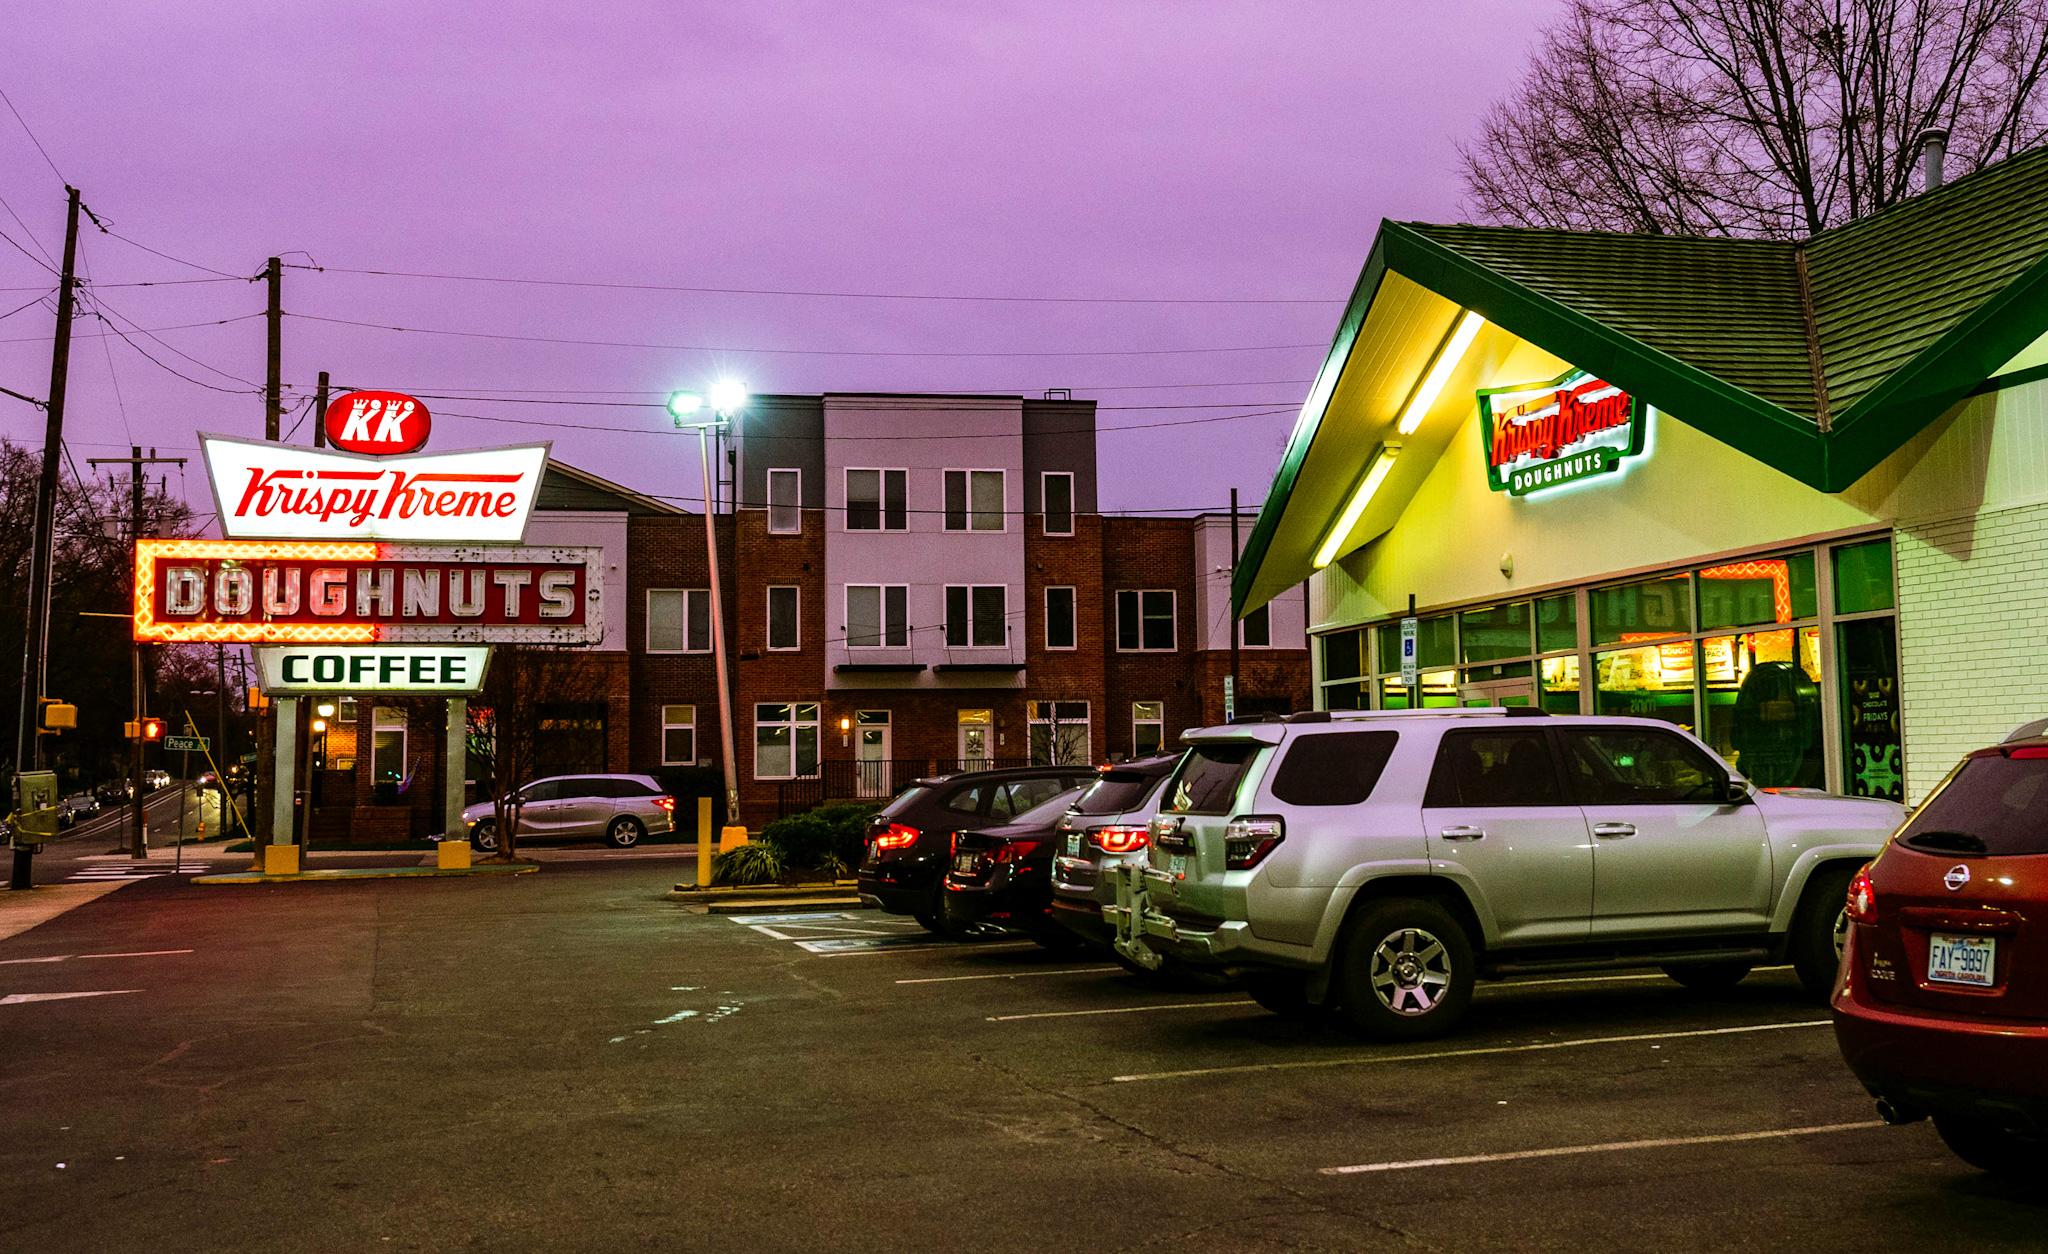 Krispy Kreme - the Original